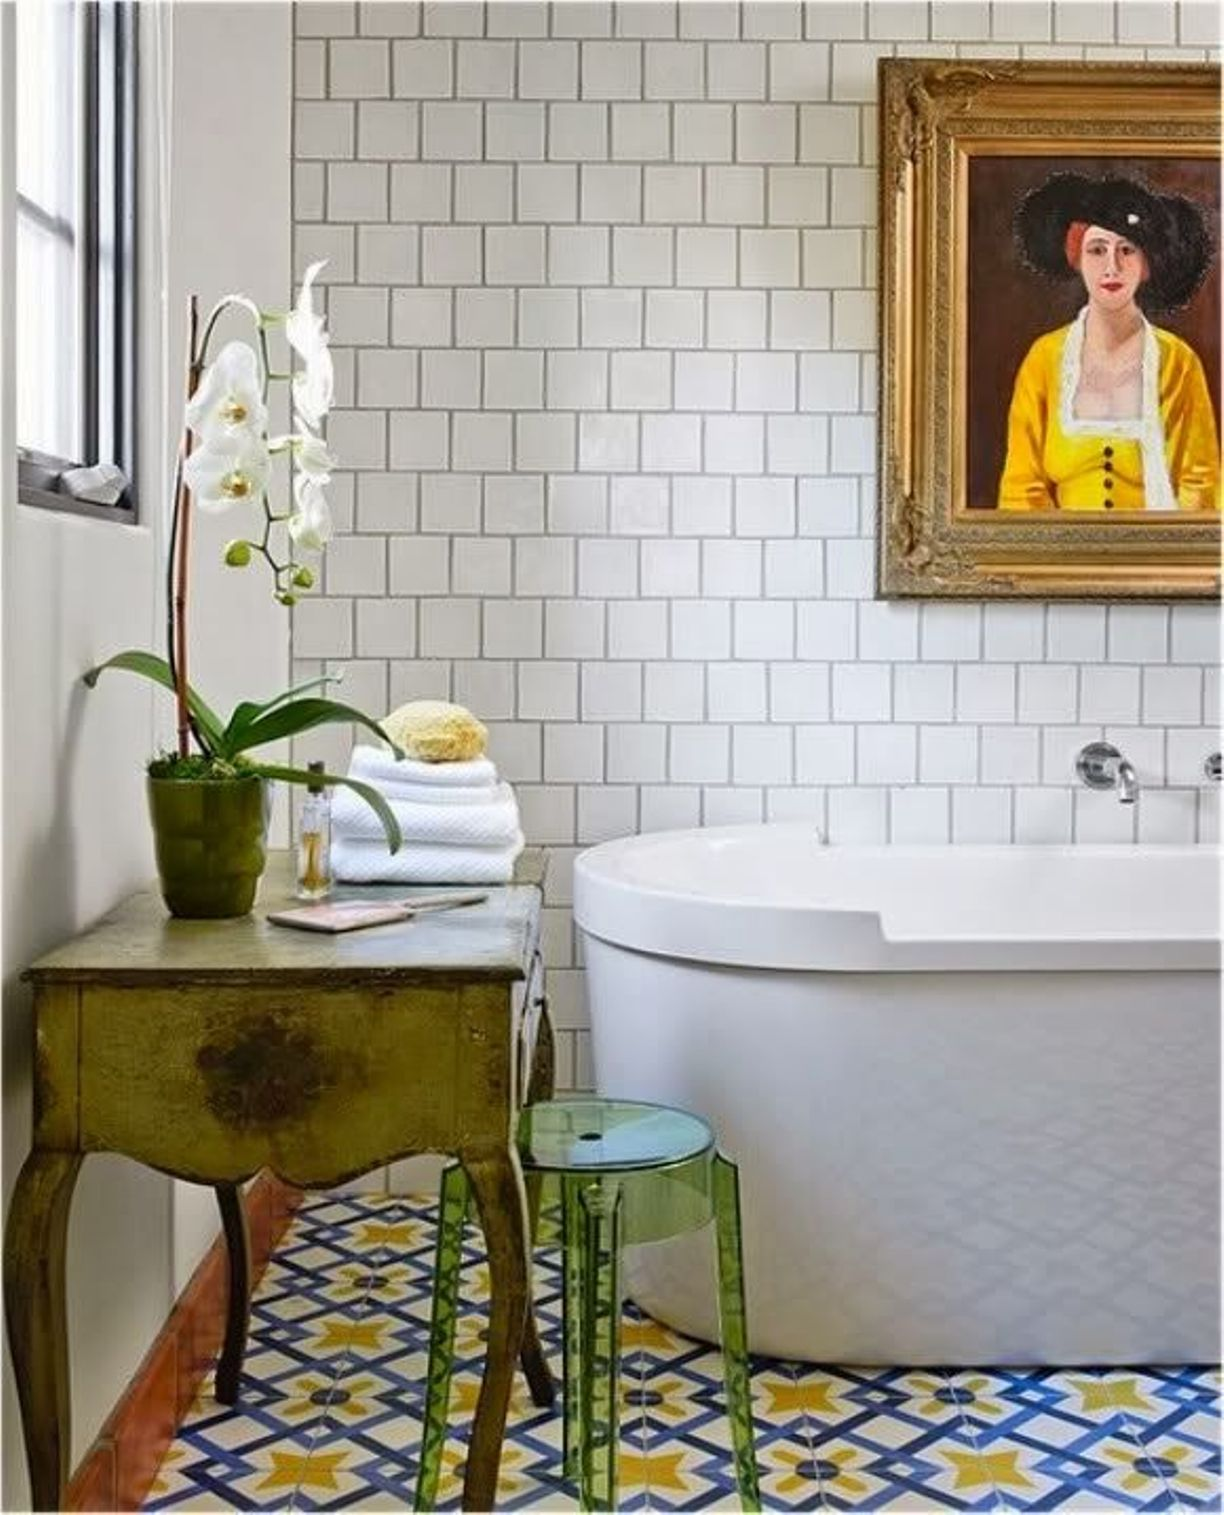 Eclectic Bathroom with Subway Tile Bathroom